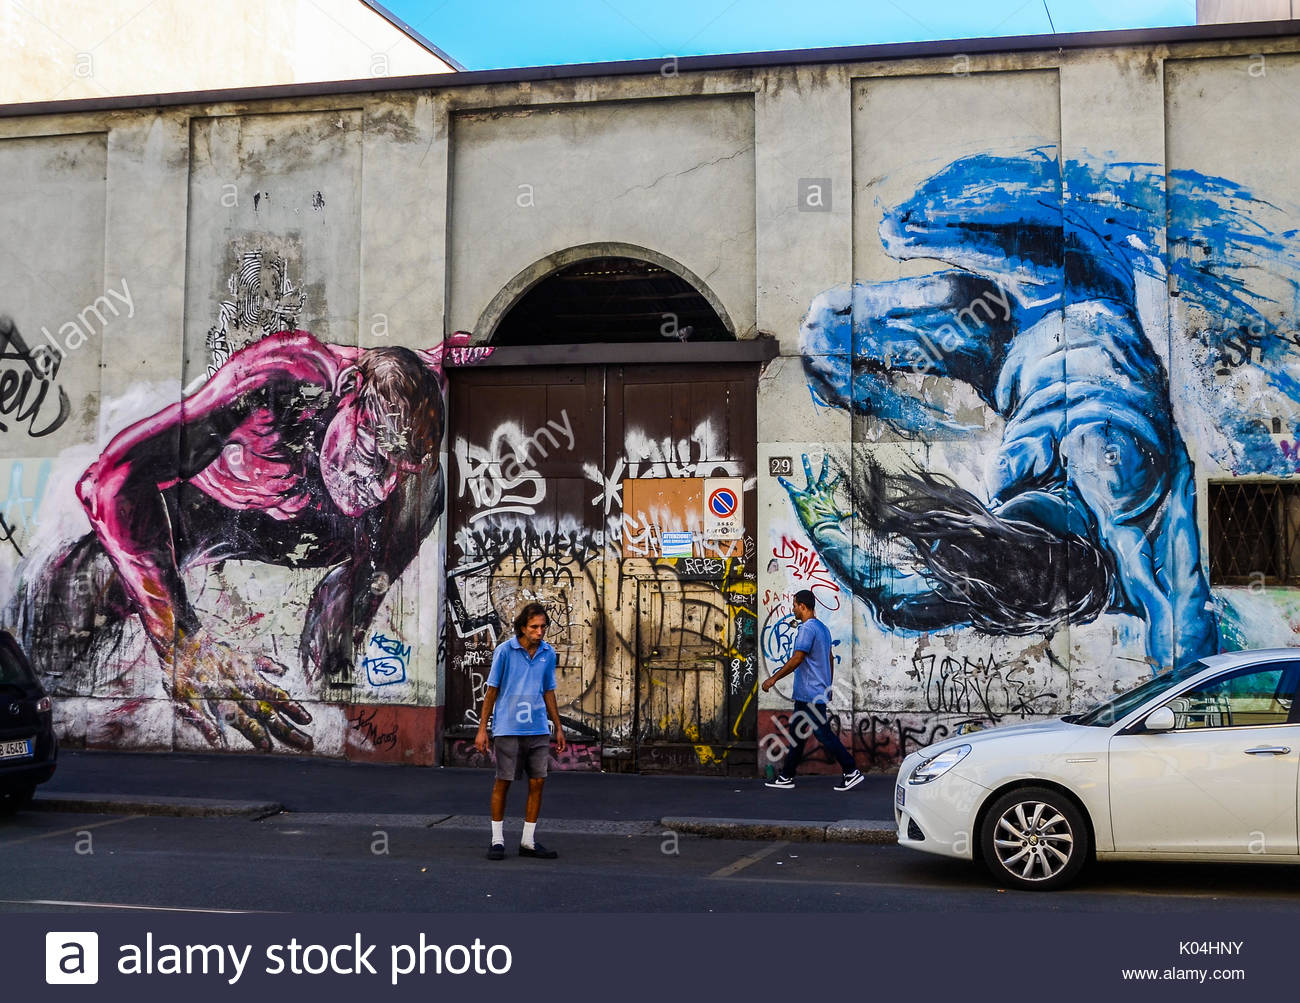 man-in-between-street-art-in-milan-italy-K04HNY.jpg